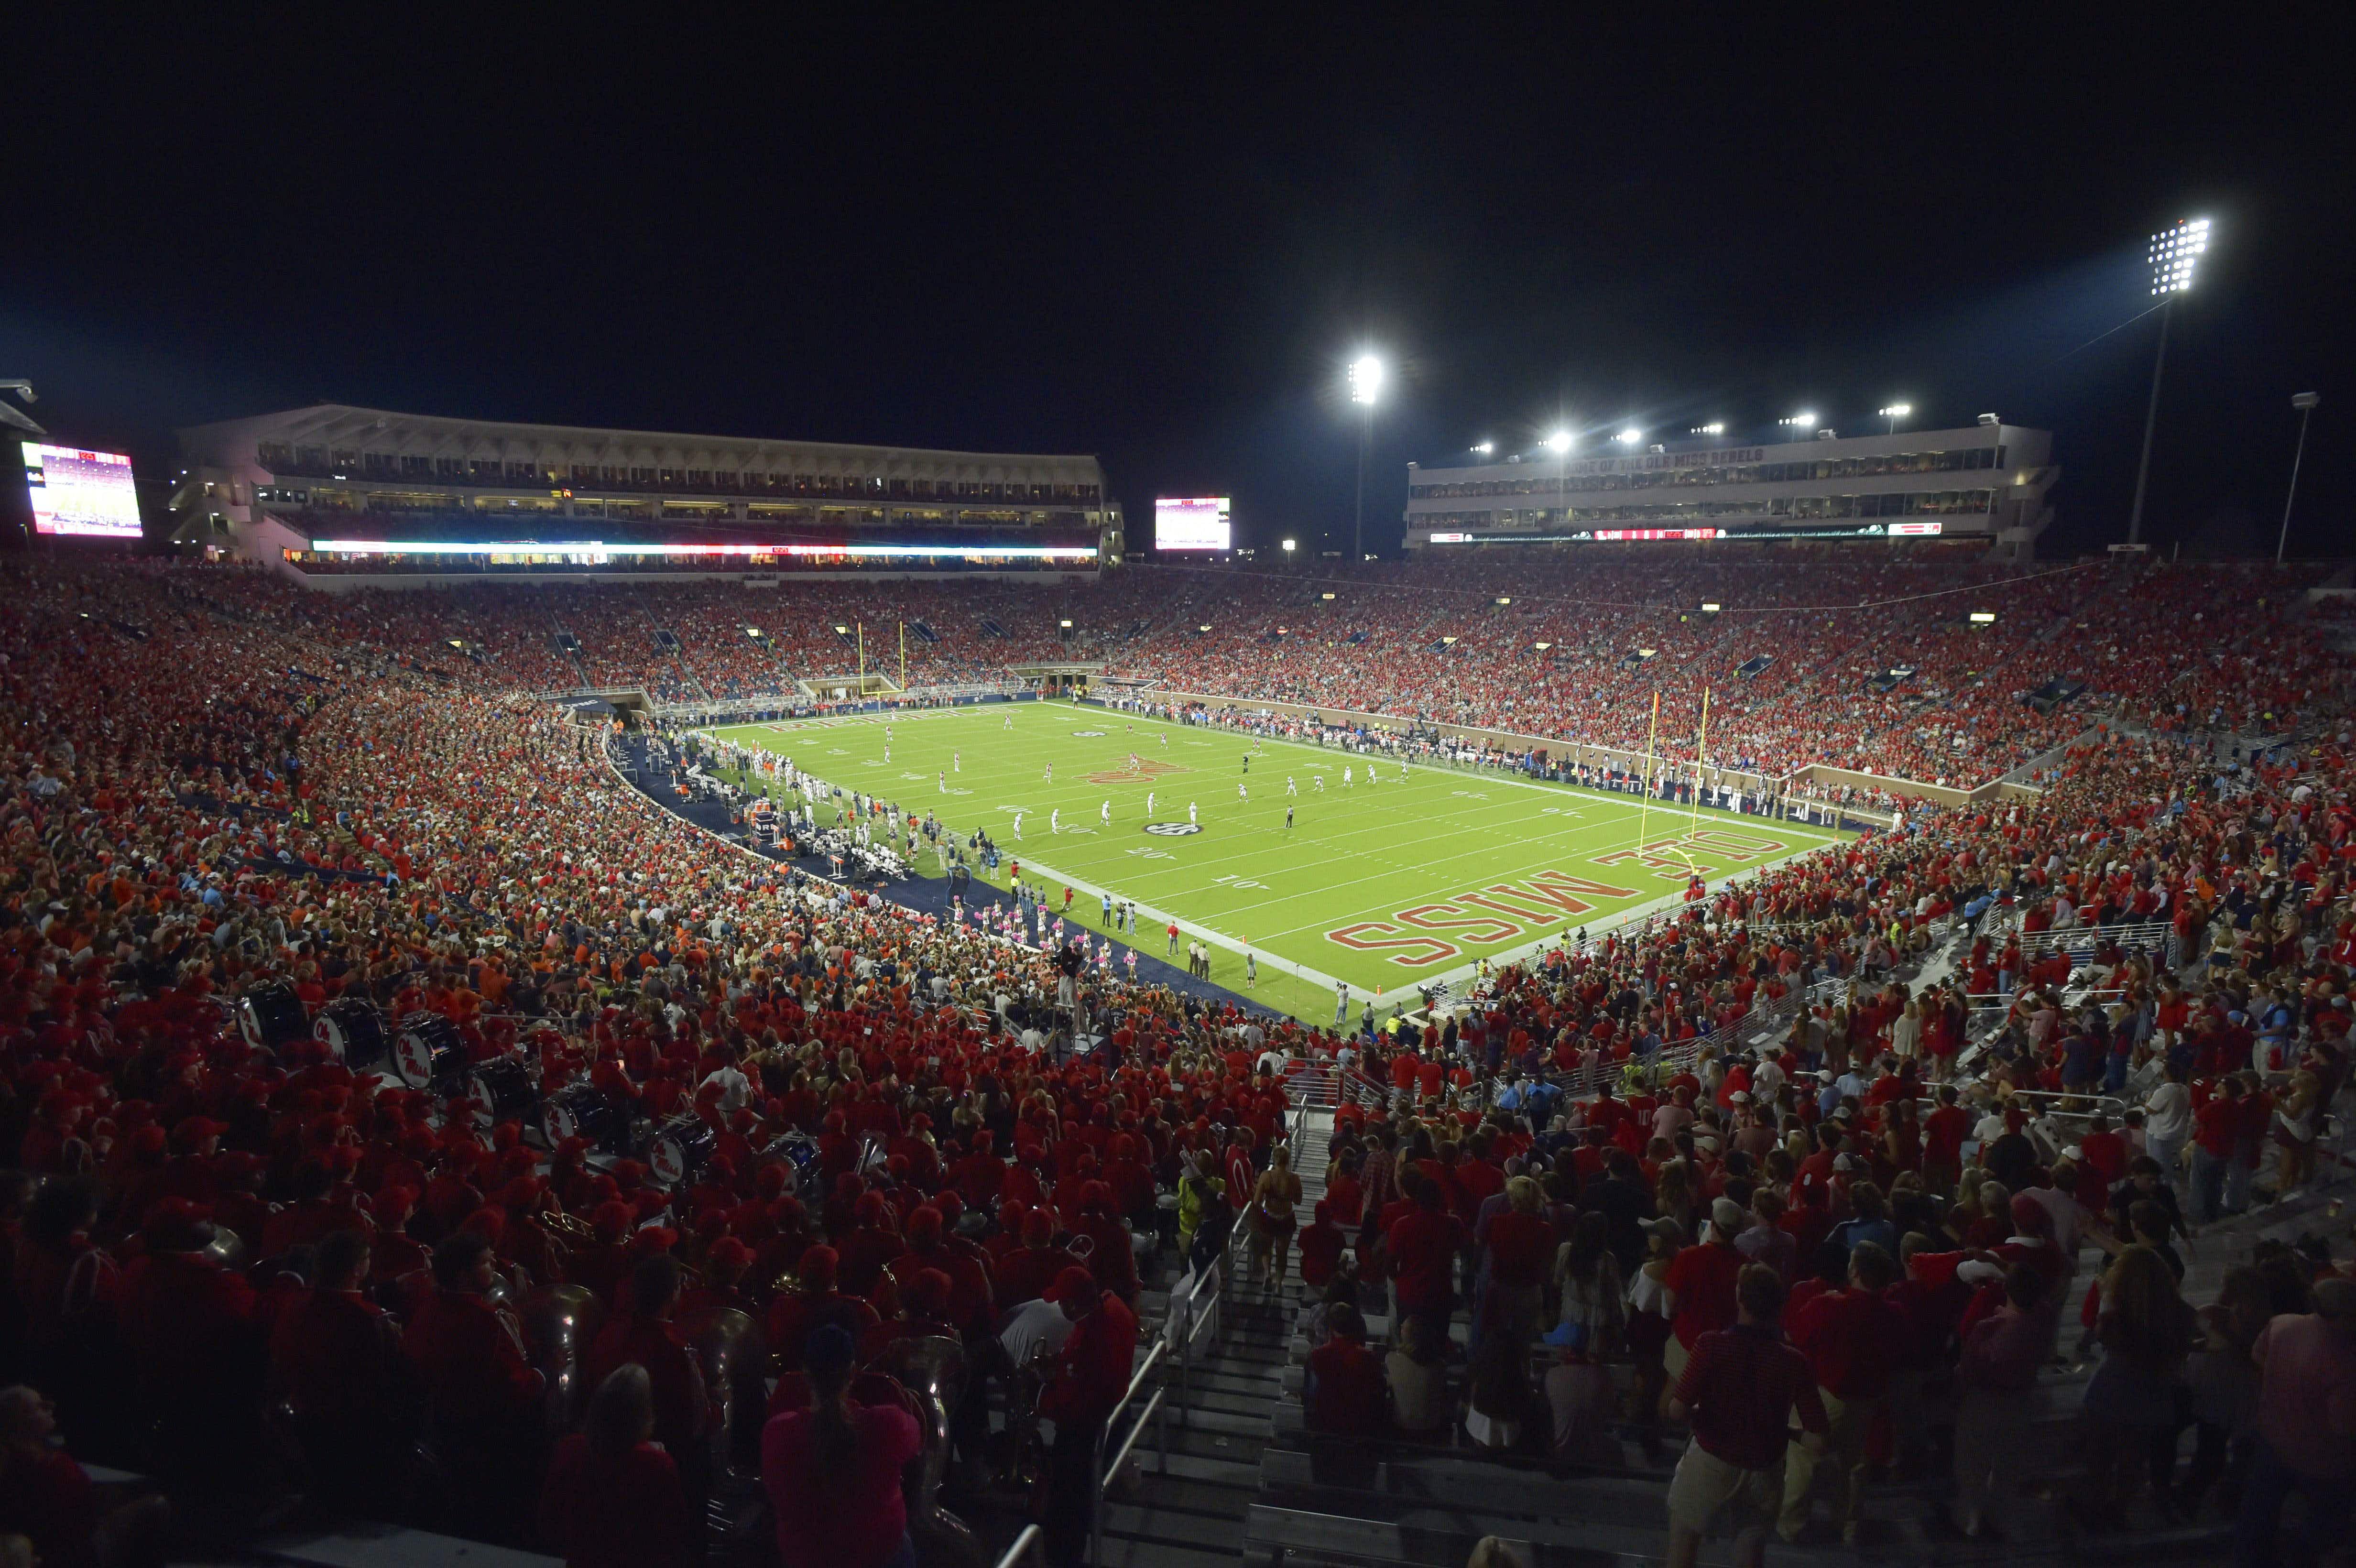 Football under the lights at Ole Miss © Austin Mcafee/CSM/REX/Shutterstock